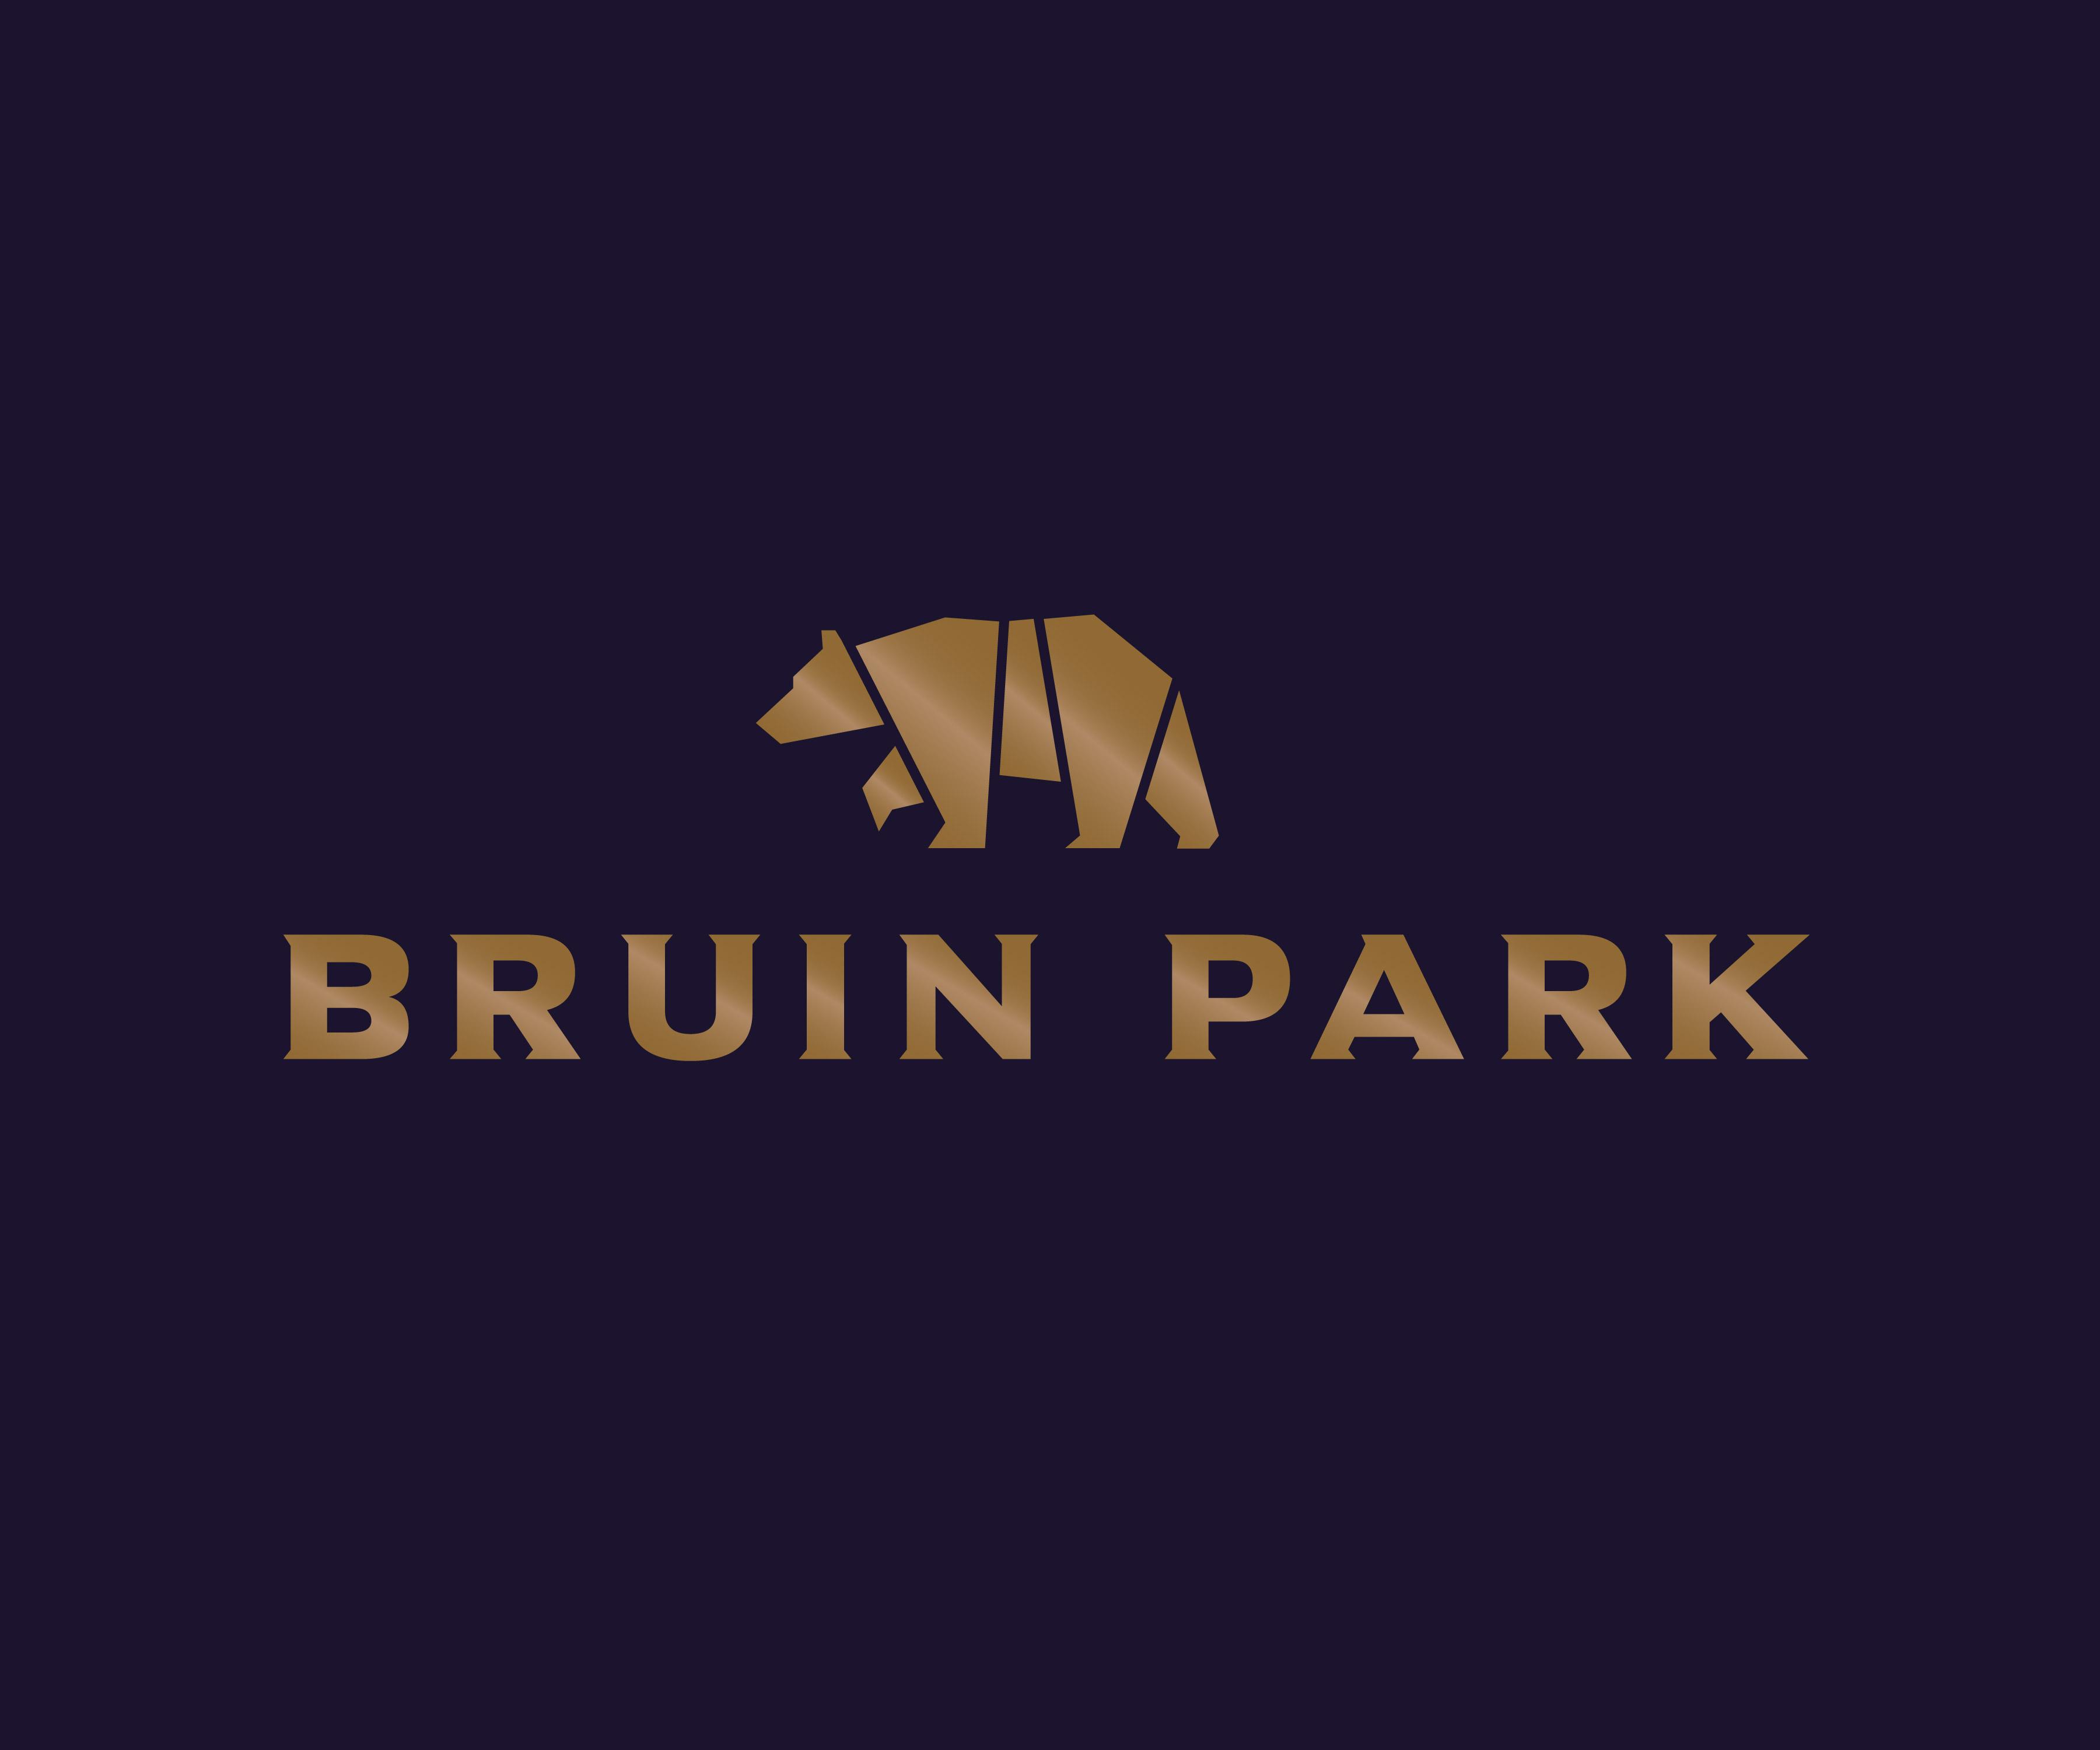 Bruin Park